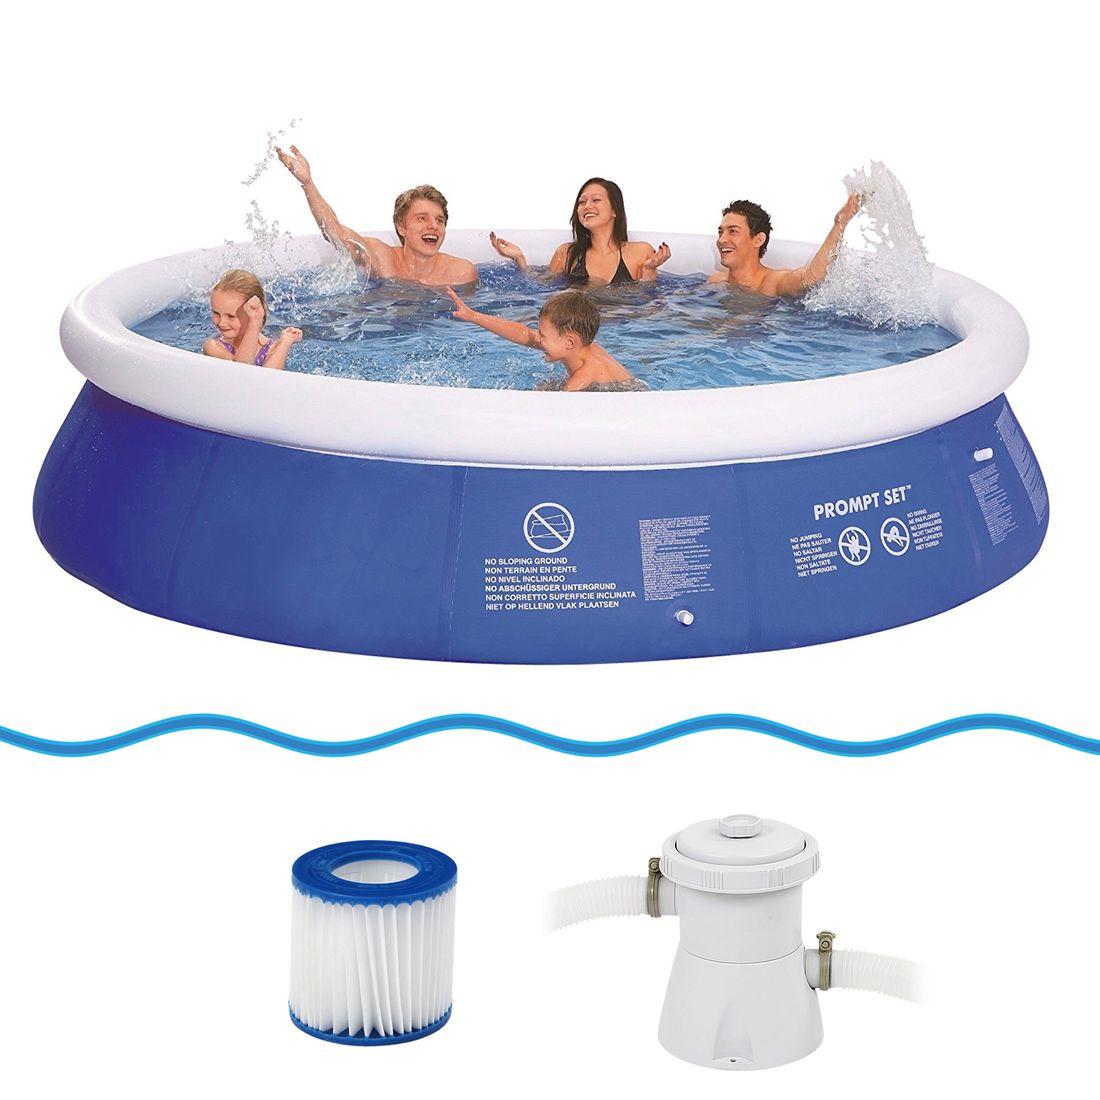 Jilong Prompt Set Pool Marin Blue 360 Set - quick-up pool set with filter  pump, 360x76cm Watersport & Pools Pools & Spas Maxi pools